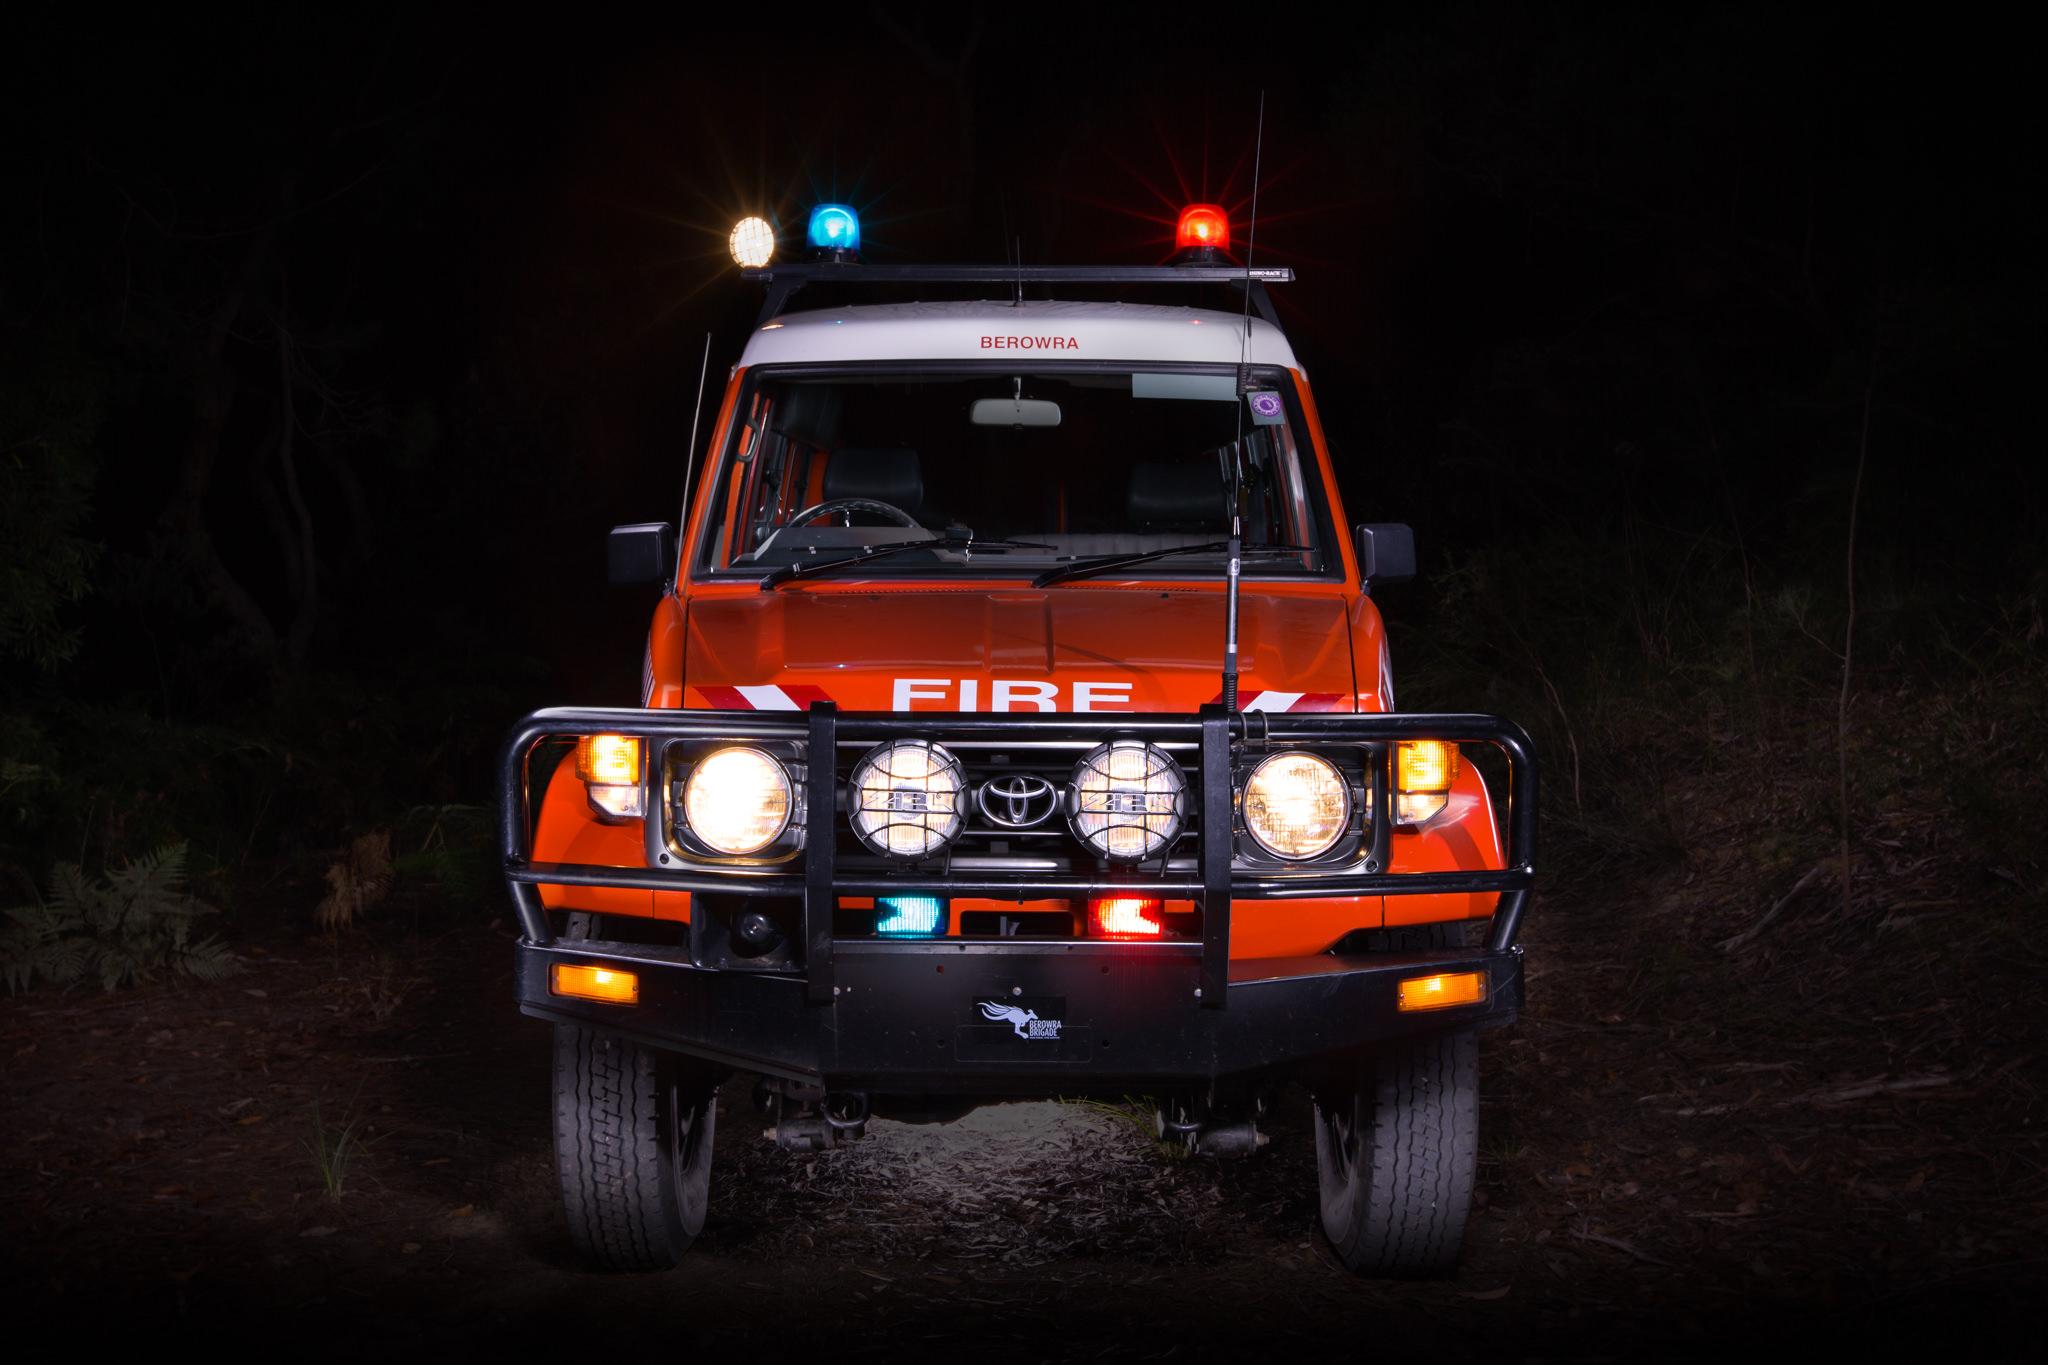 Berowra RFS Land Cruiser - Emergency Service Vehicle Photography